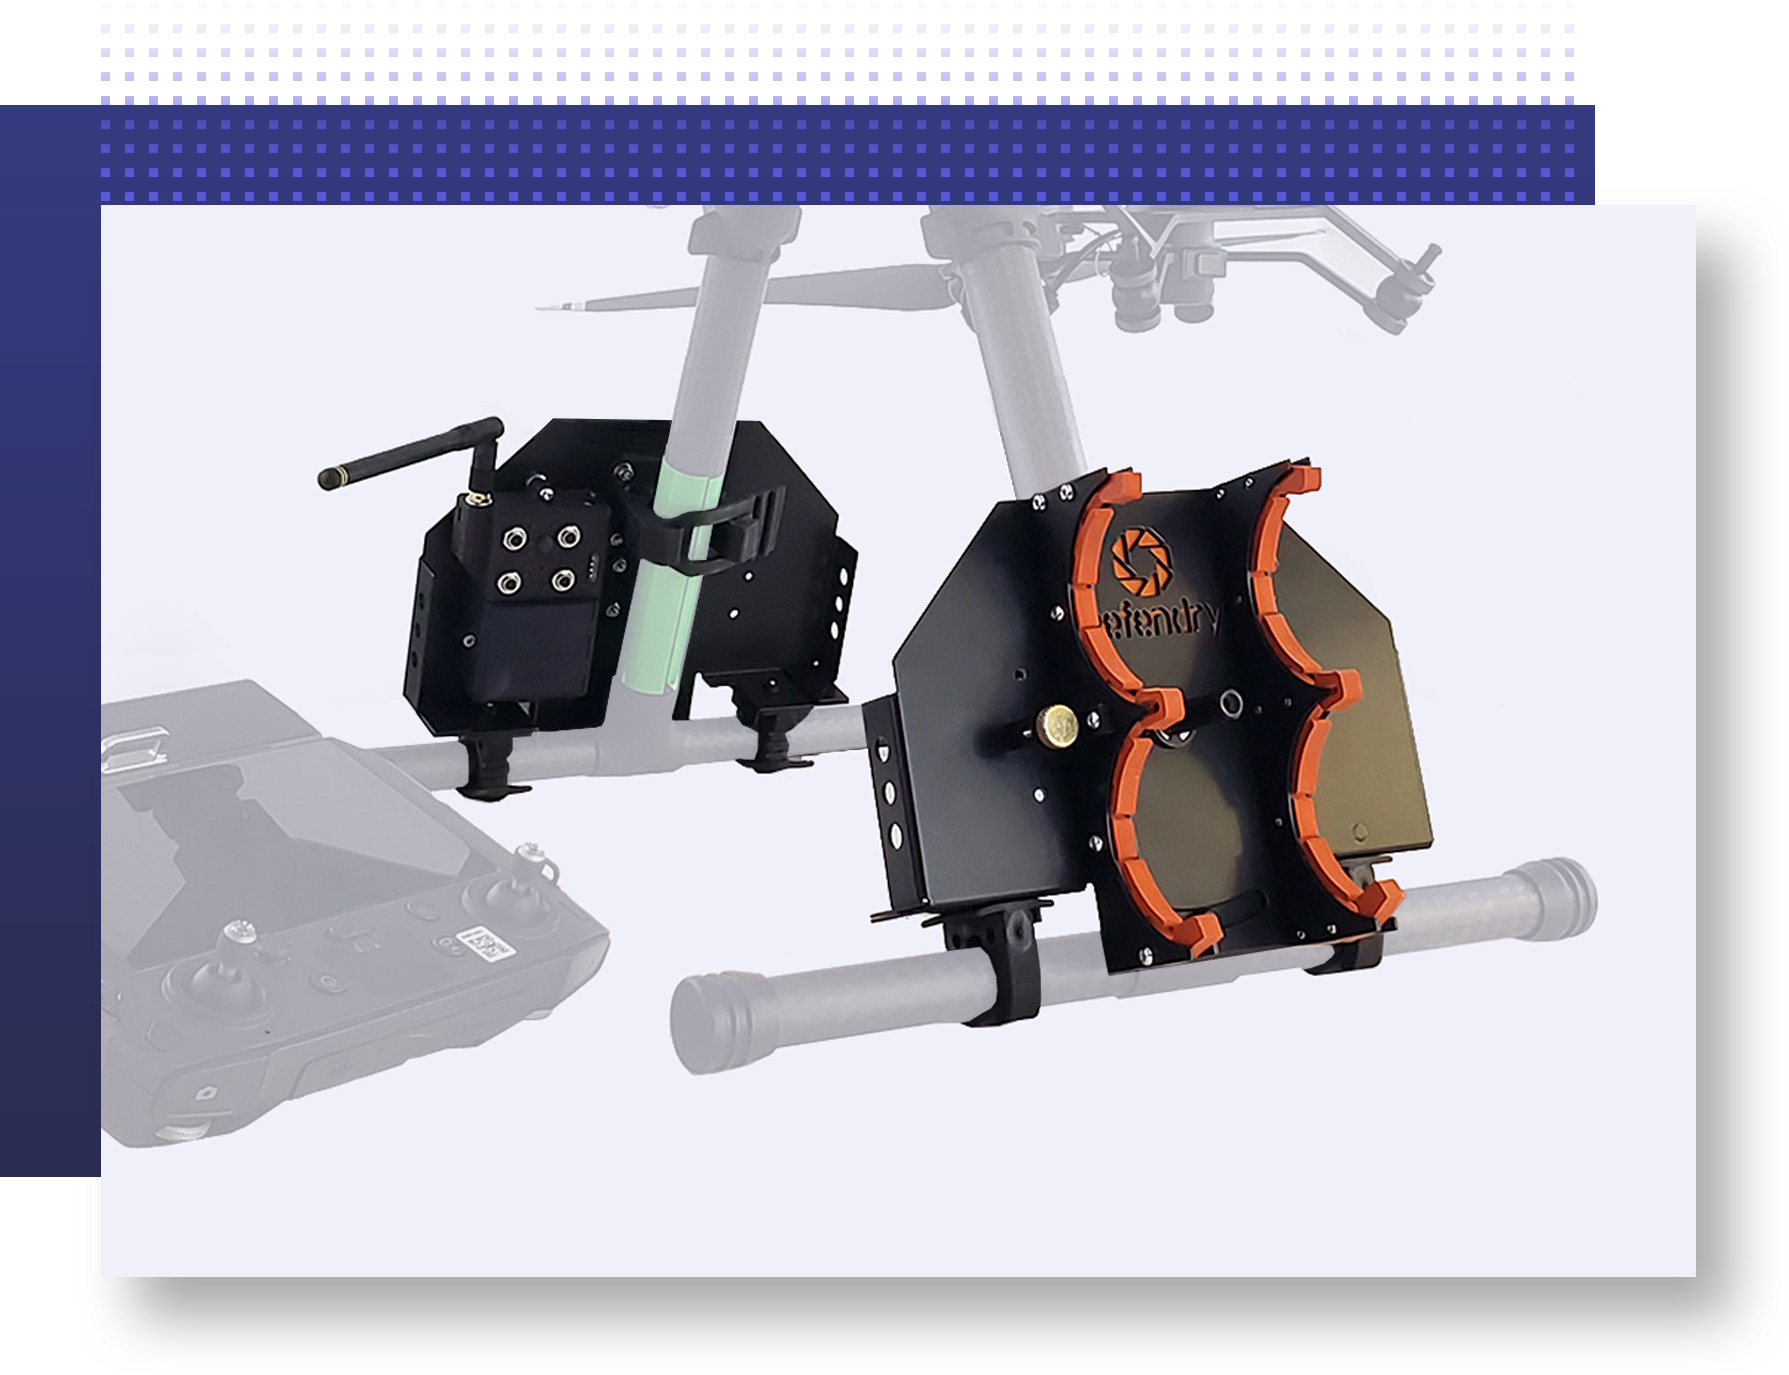 Law enfocement drone accessory